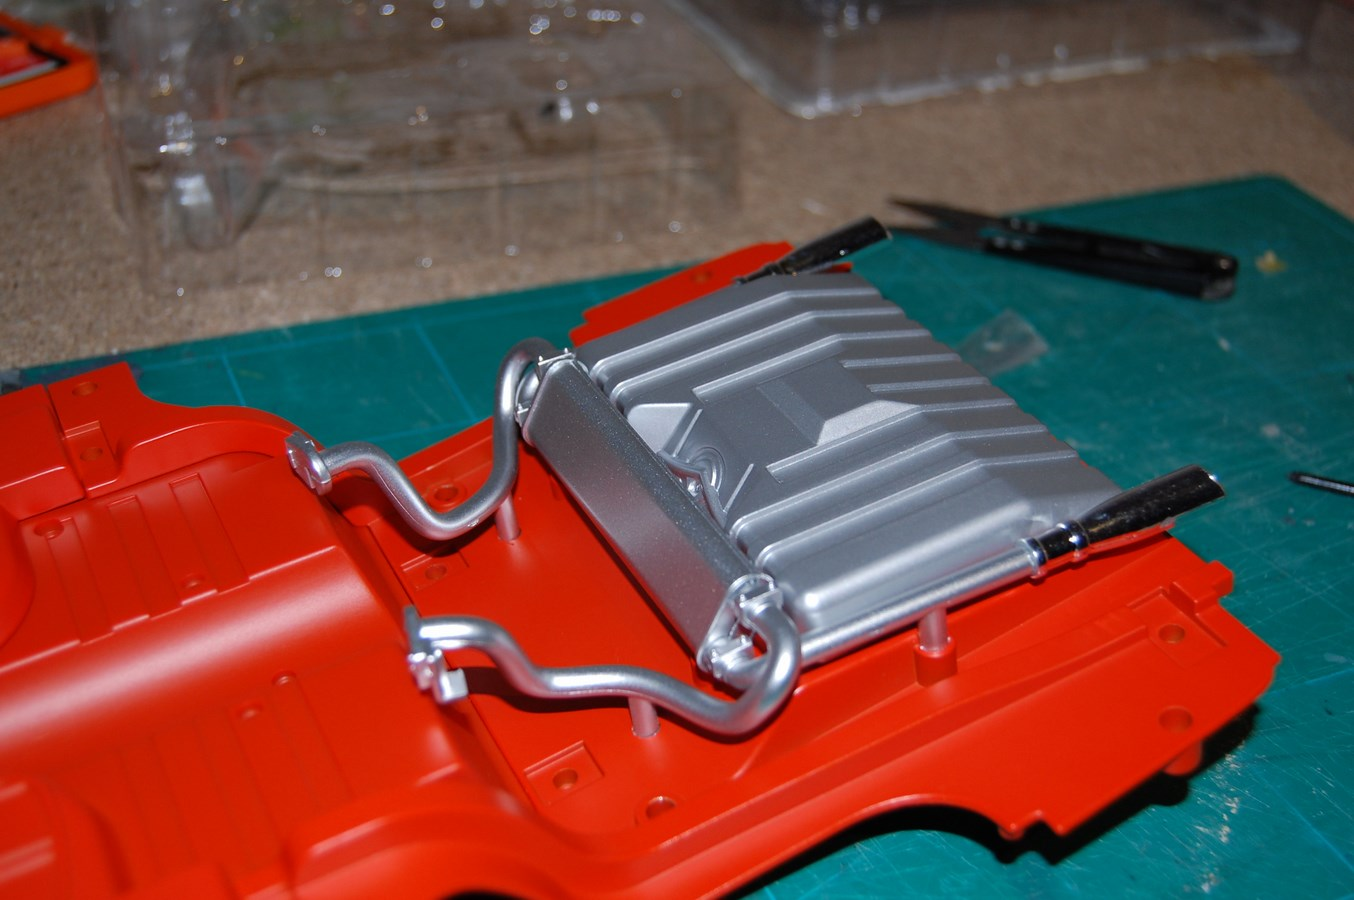 Shelby GT500 1967  de Altaya échelle 1/8° - Page 2 325445ShelbyMustang6729Copier